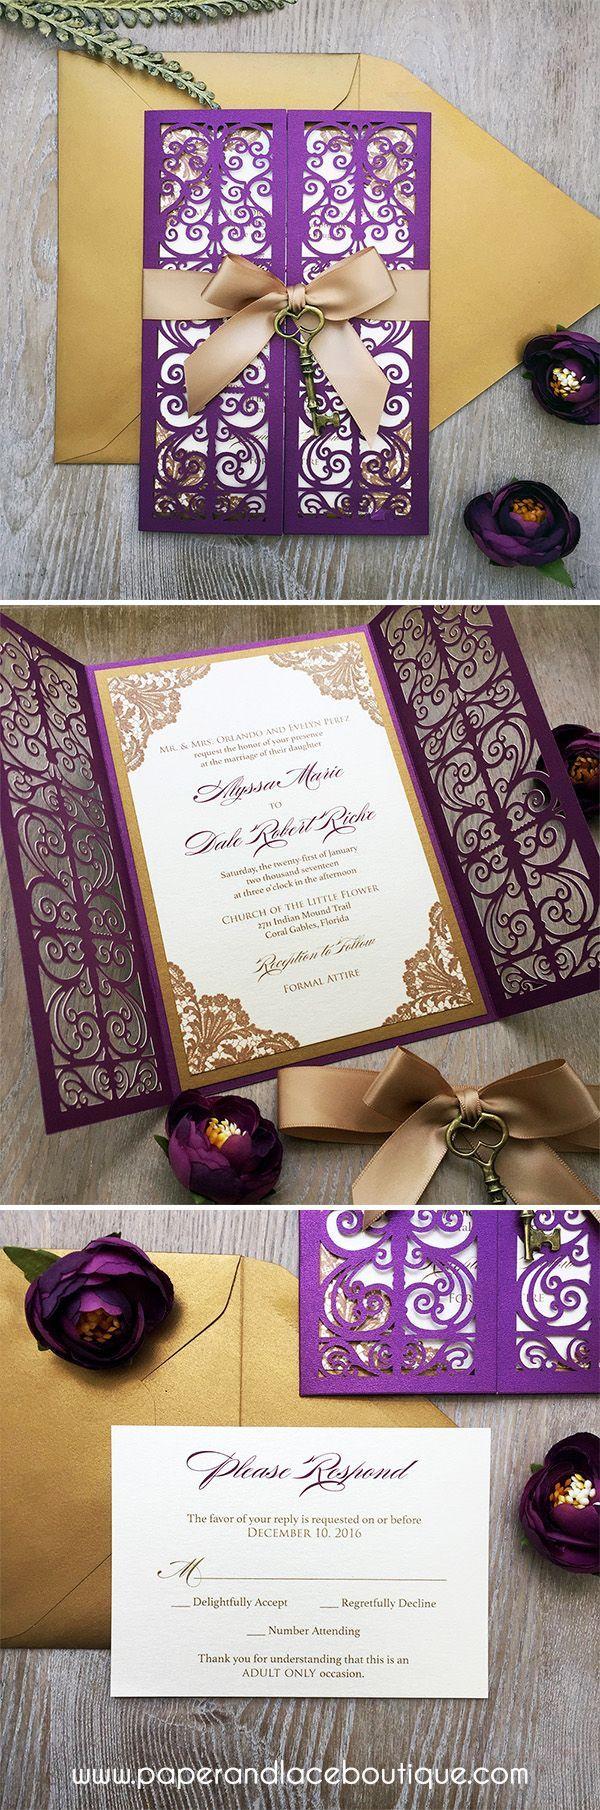 ALYSSA - Gold and Plum Laser Cut Wedding Invitation - Purple Shimmer Laser Cut Gatefold Doors w/ Gold Ribbon and Bronze Key